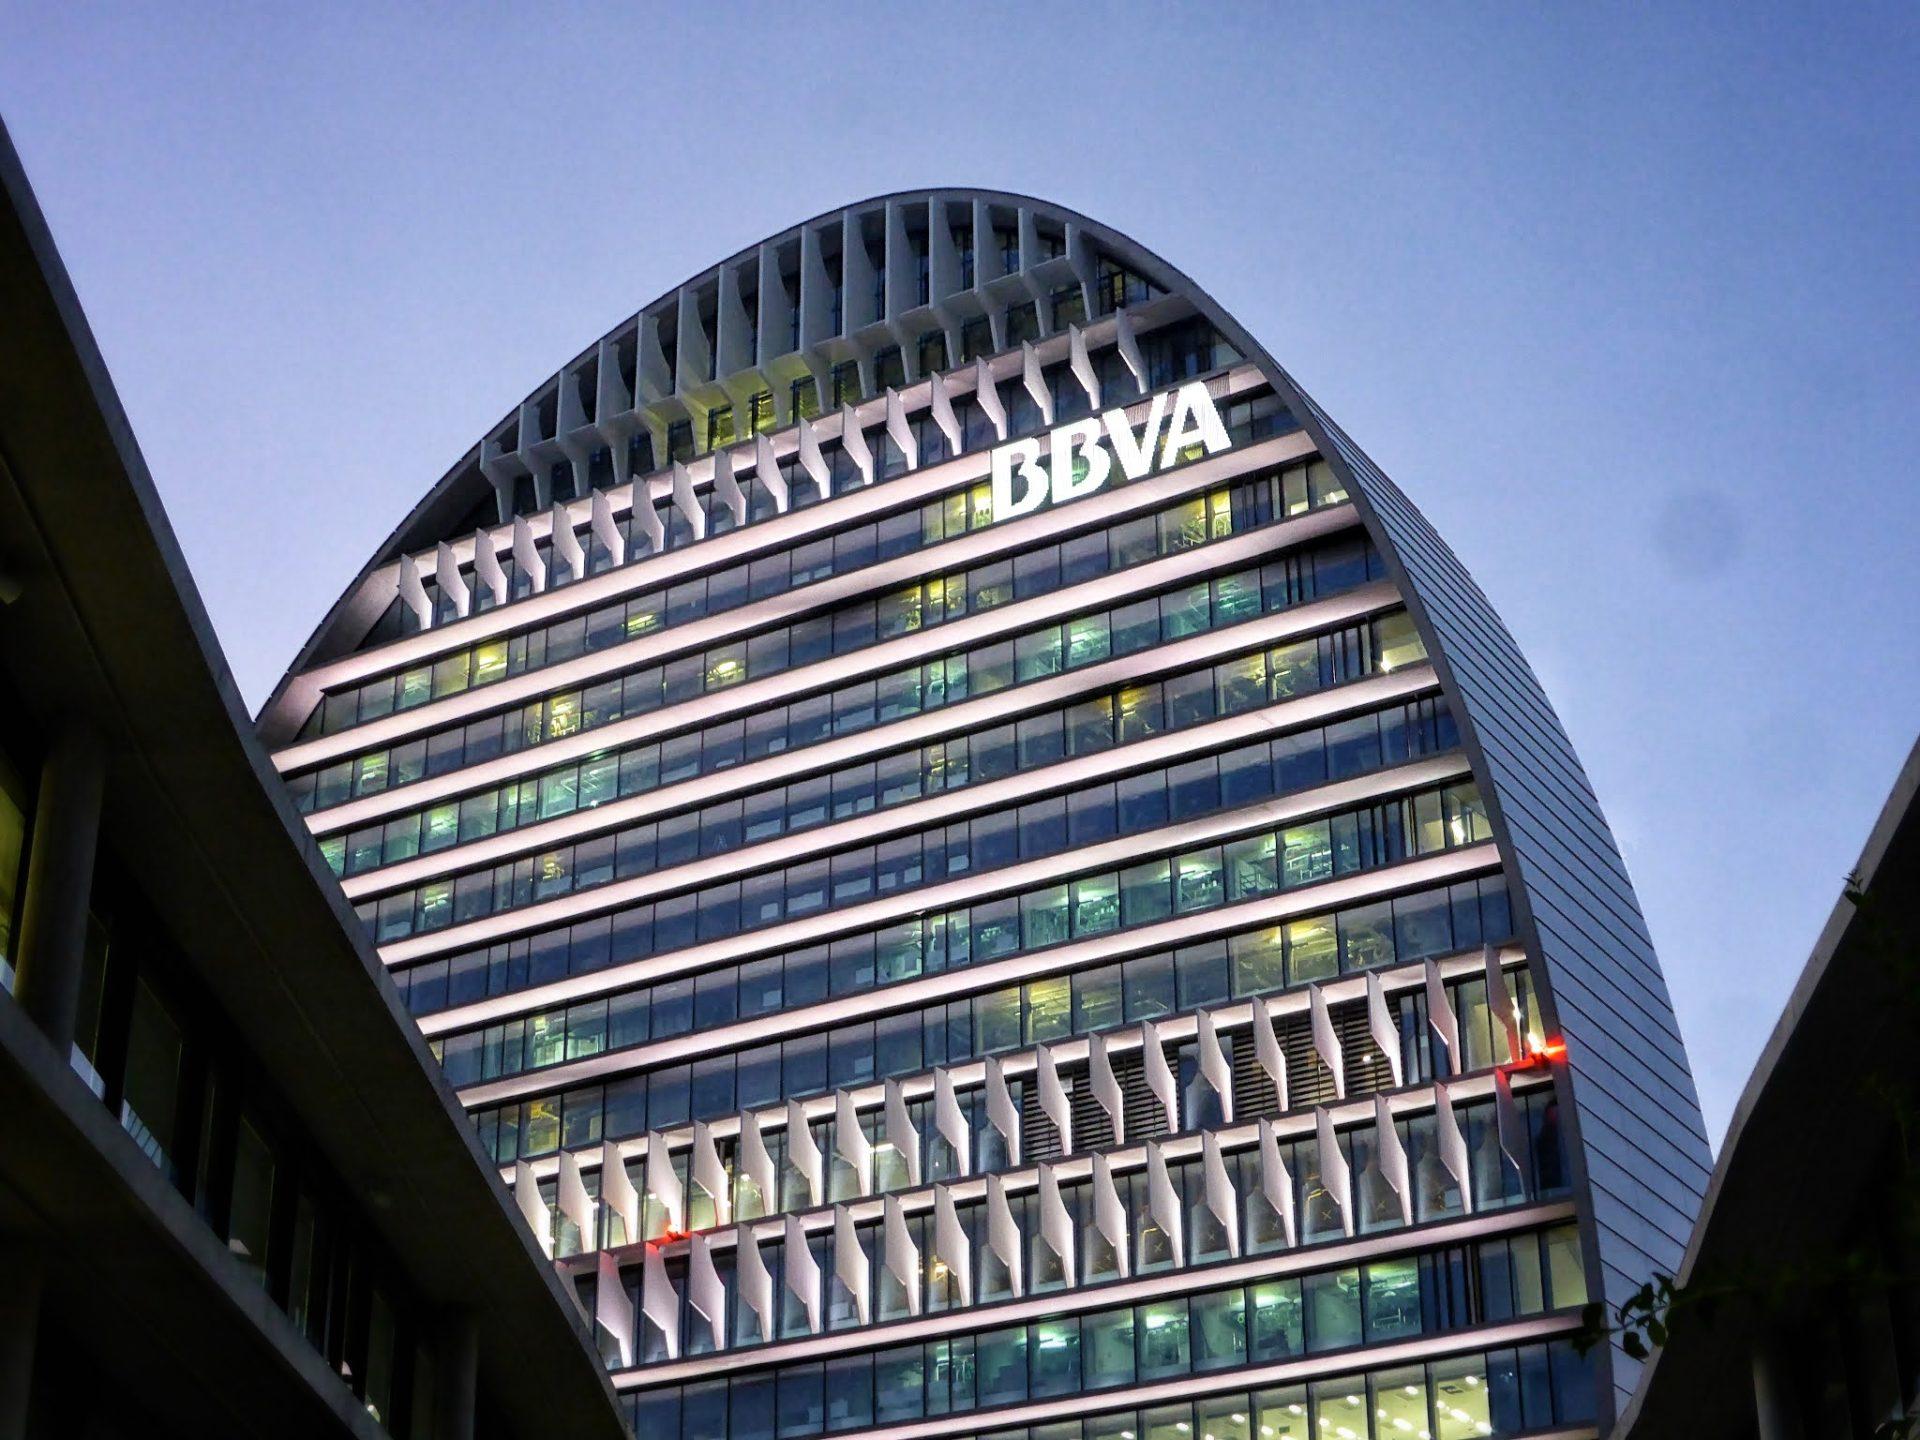 https://accionistaseinversores.bbva.com/wp-content/uploads/2019/02/12.-La-Vela-Ciudad-BBVA-1920x1440.jpg